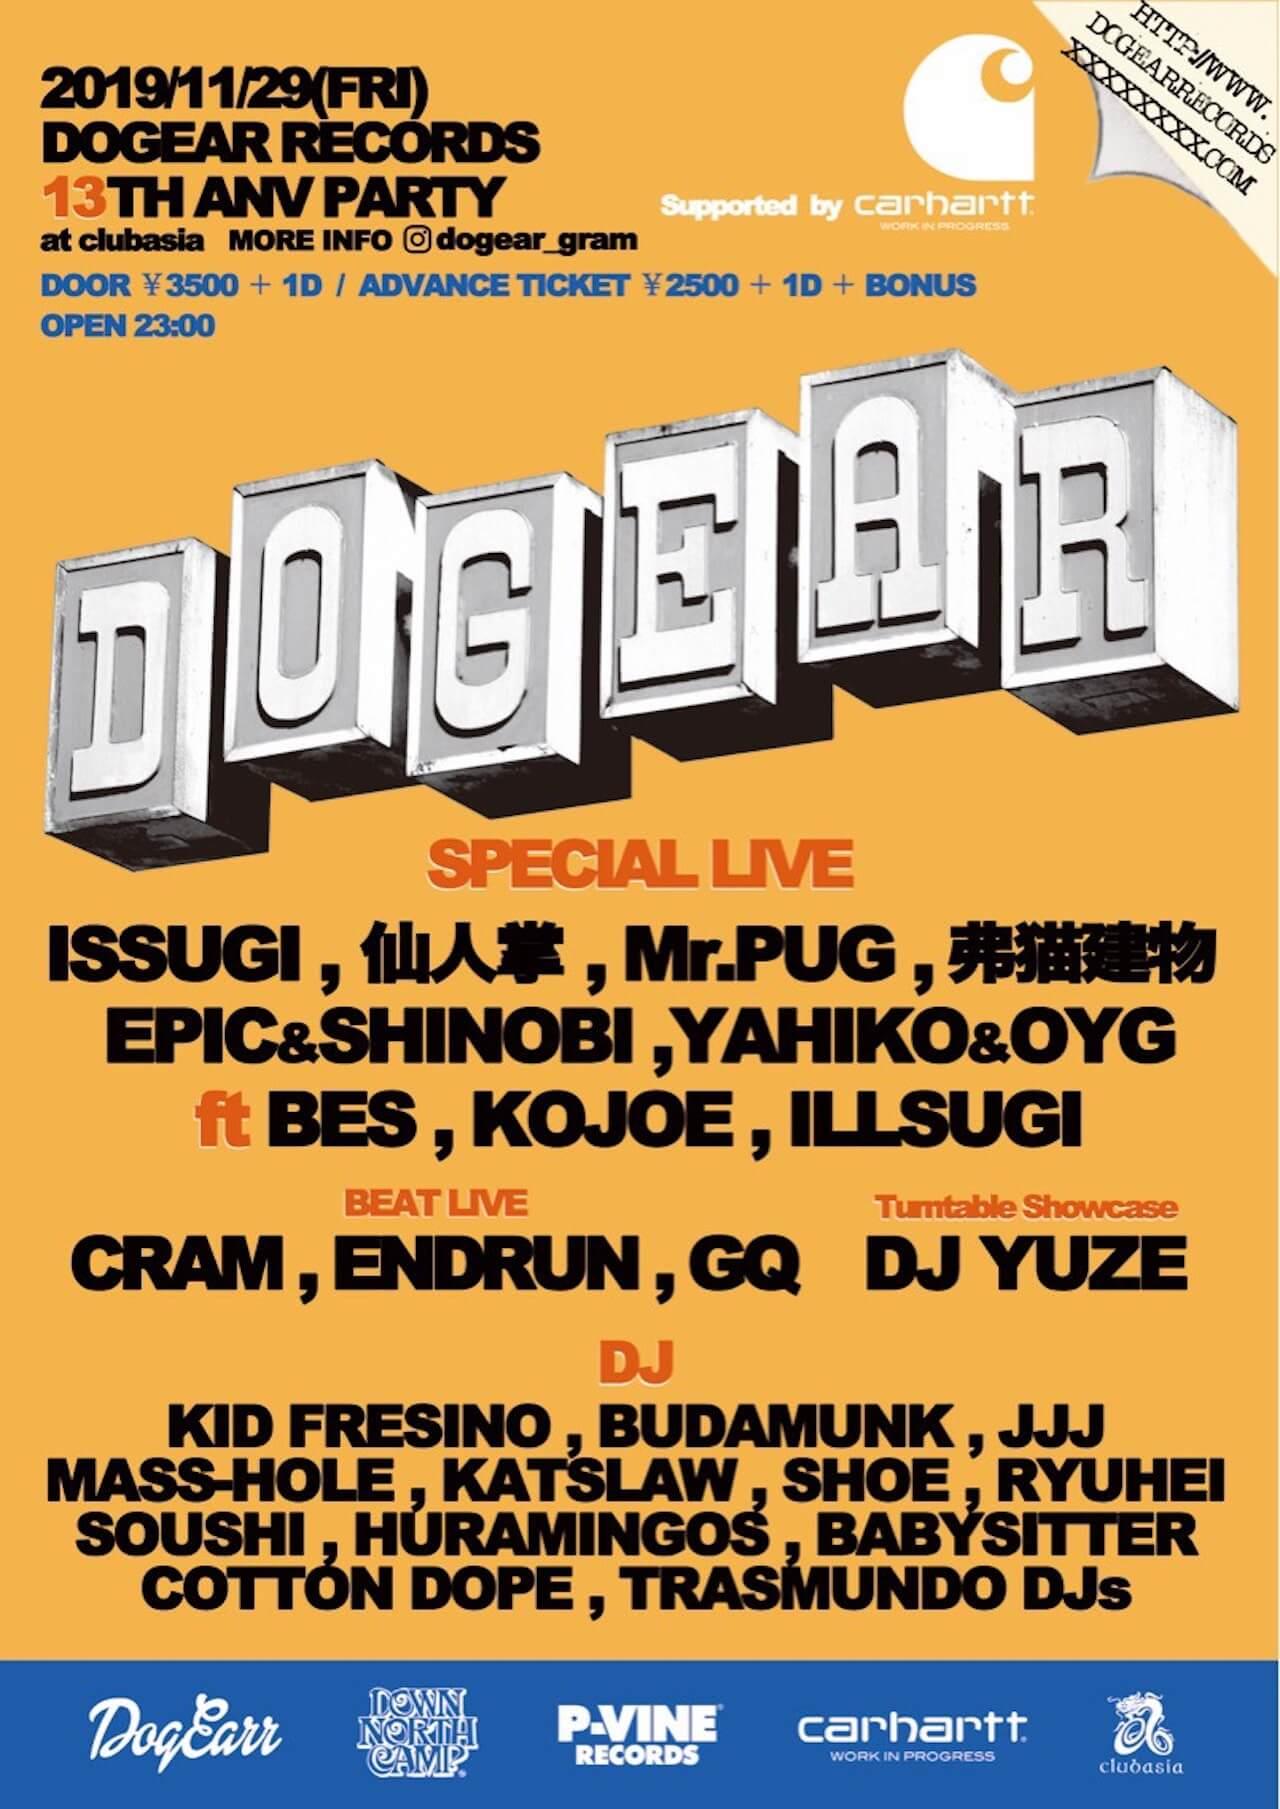 〈DOGEAR RECORDS〉の13周年パーティーが開催|Mr.PUG、ISSUGI、仙人掌、KID FRESINO、JJJ、BUDAMUNKらが登場 music191106-dogearrecords-1